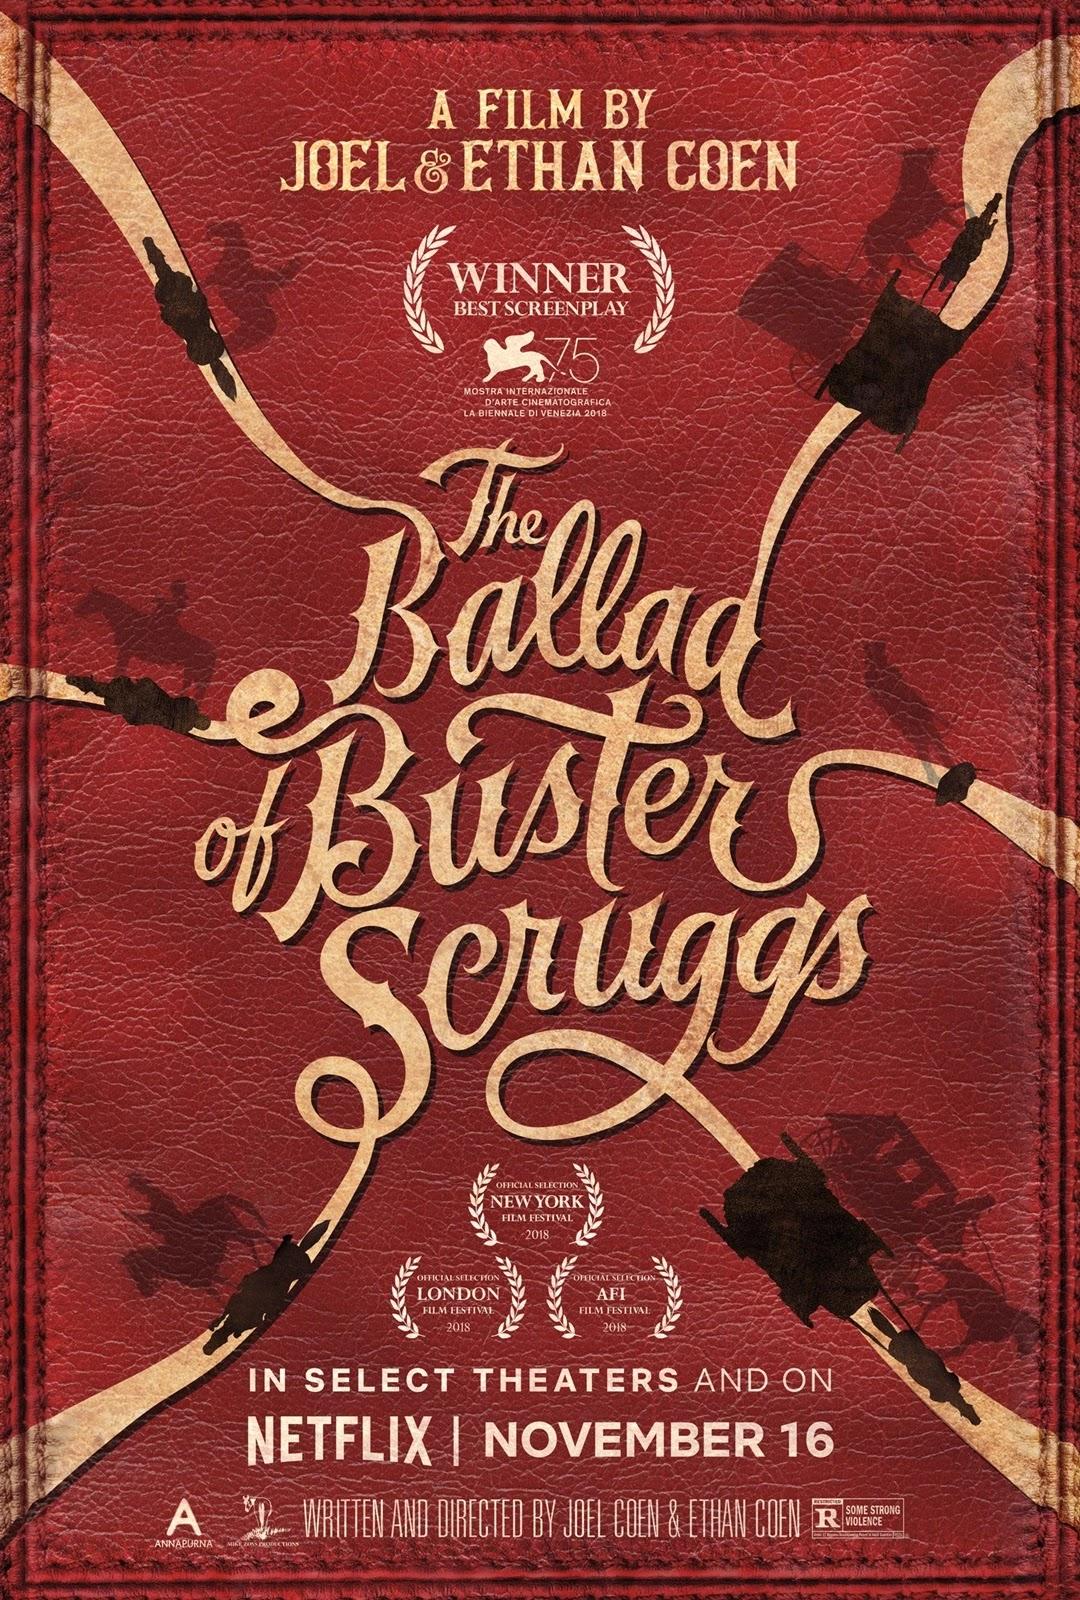 the ballad of buster scruggs,西部傳奇,西部老巴的故事,細說當年話西部,巴斯特斯克魯格斯的歌謠,海報,poster